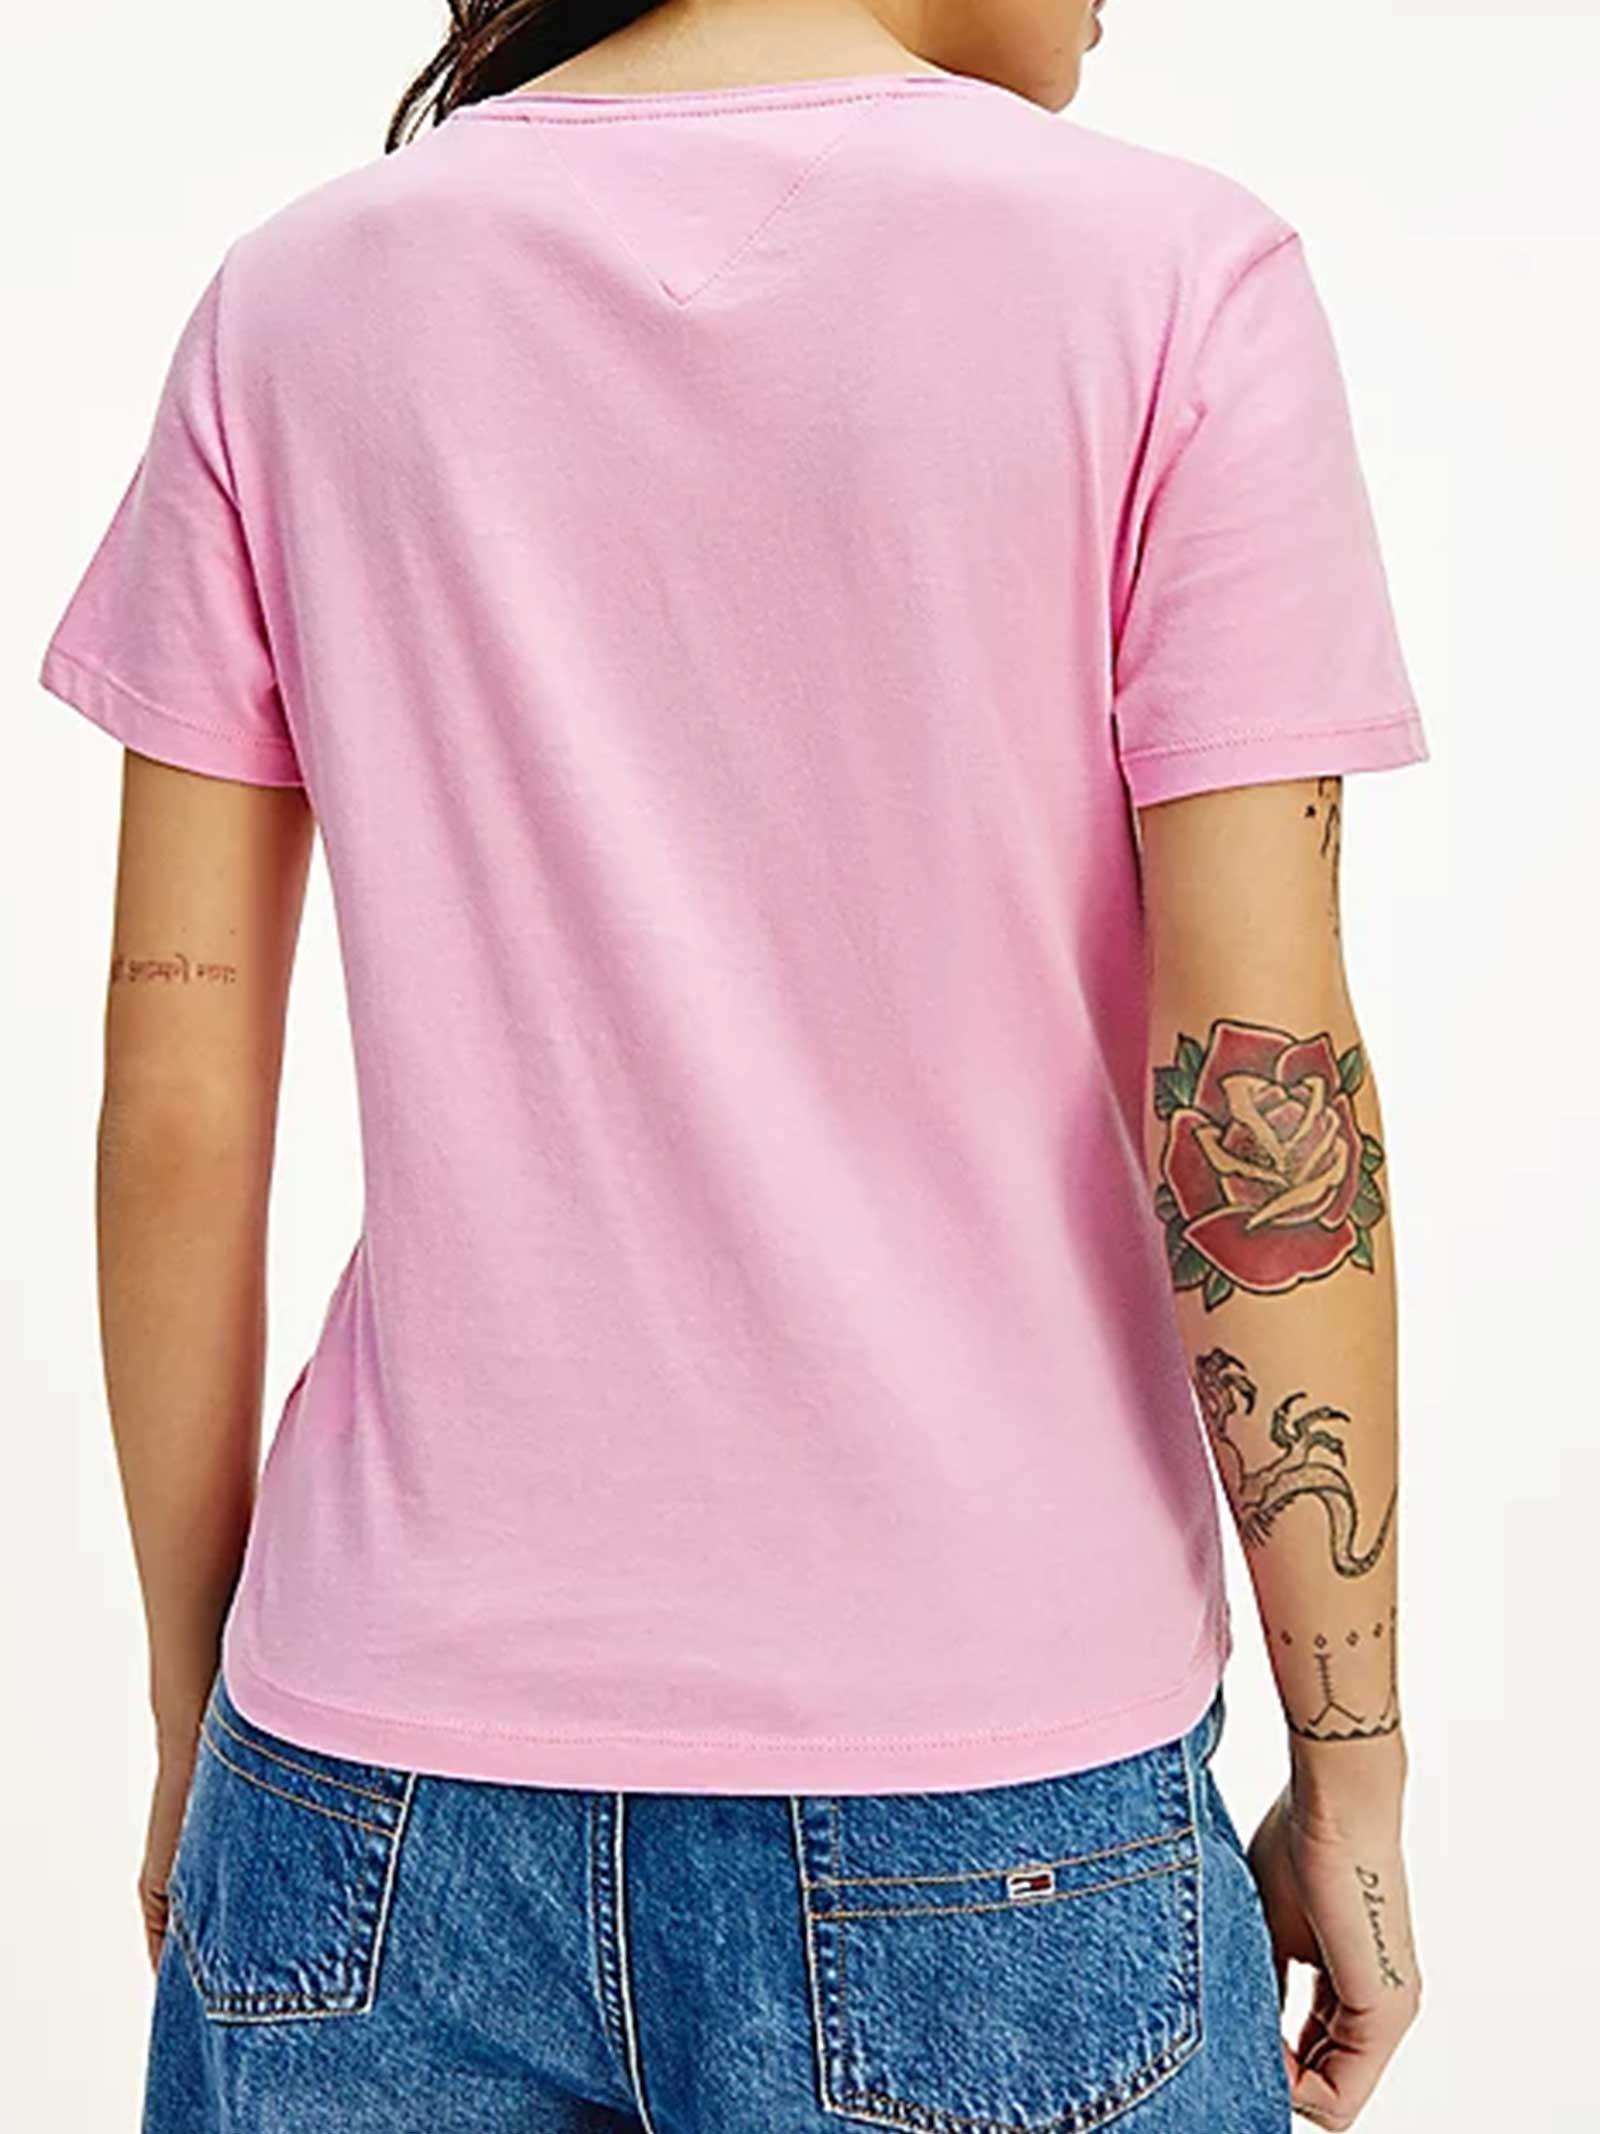 T-SHIRT DONNA TOMMY HILFIGER | T-shirt | DW0DW09195TOU